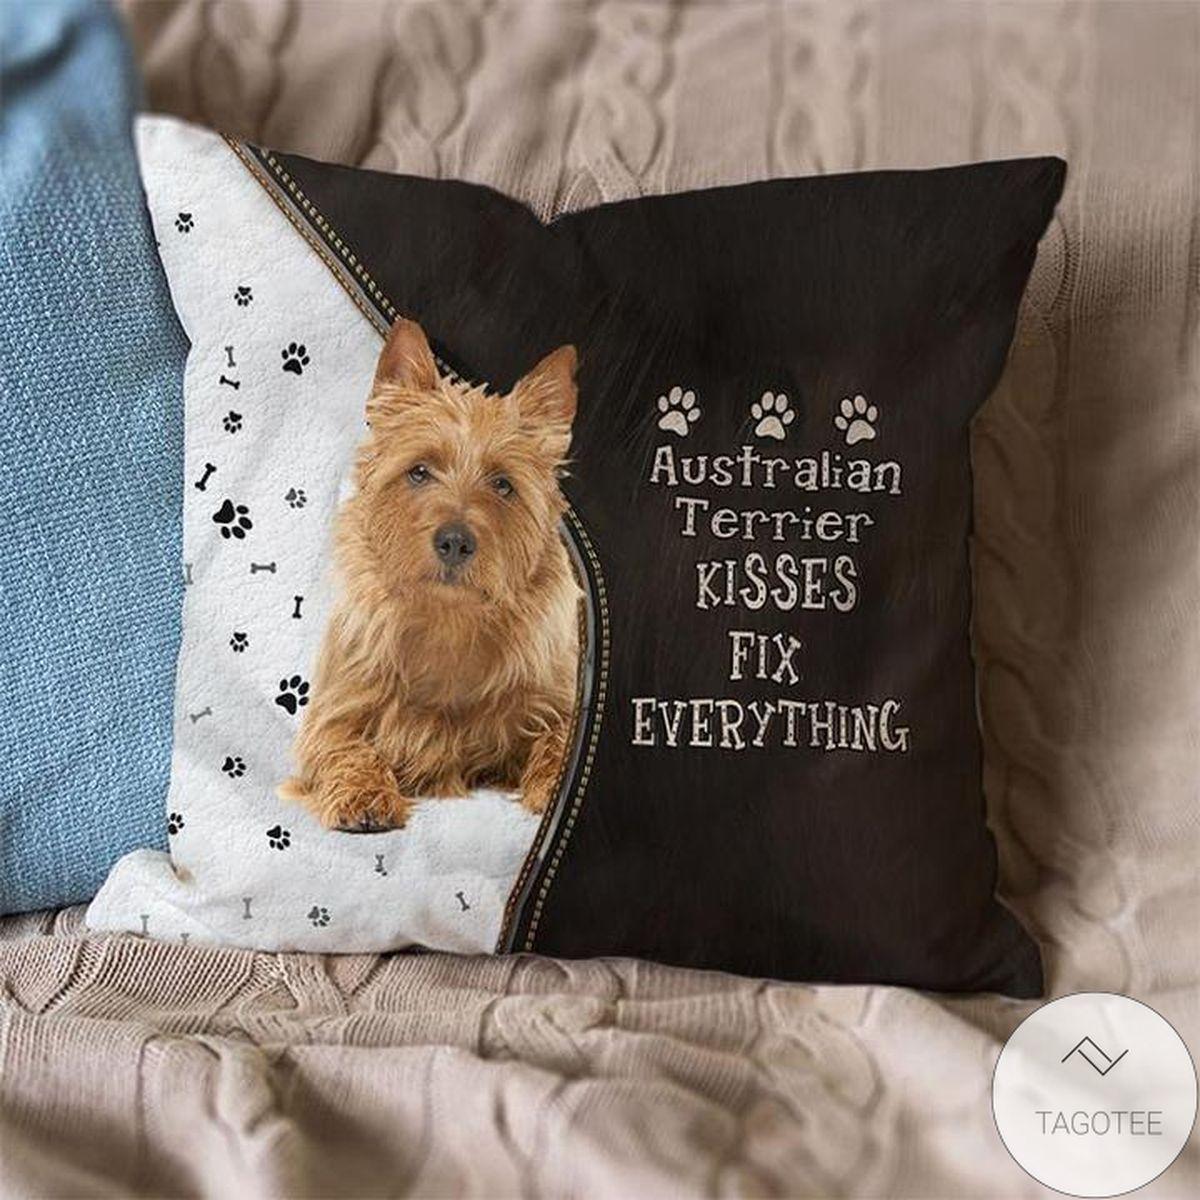 Free Ship Australian Terrier Kisses Fix Everything Pillowcase